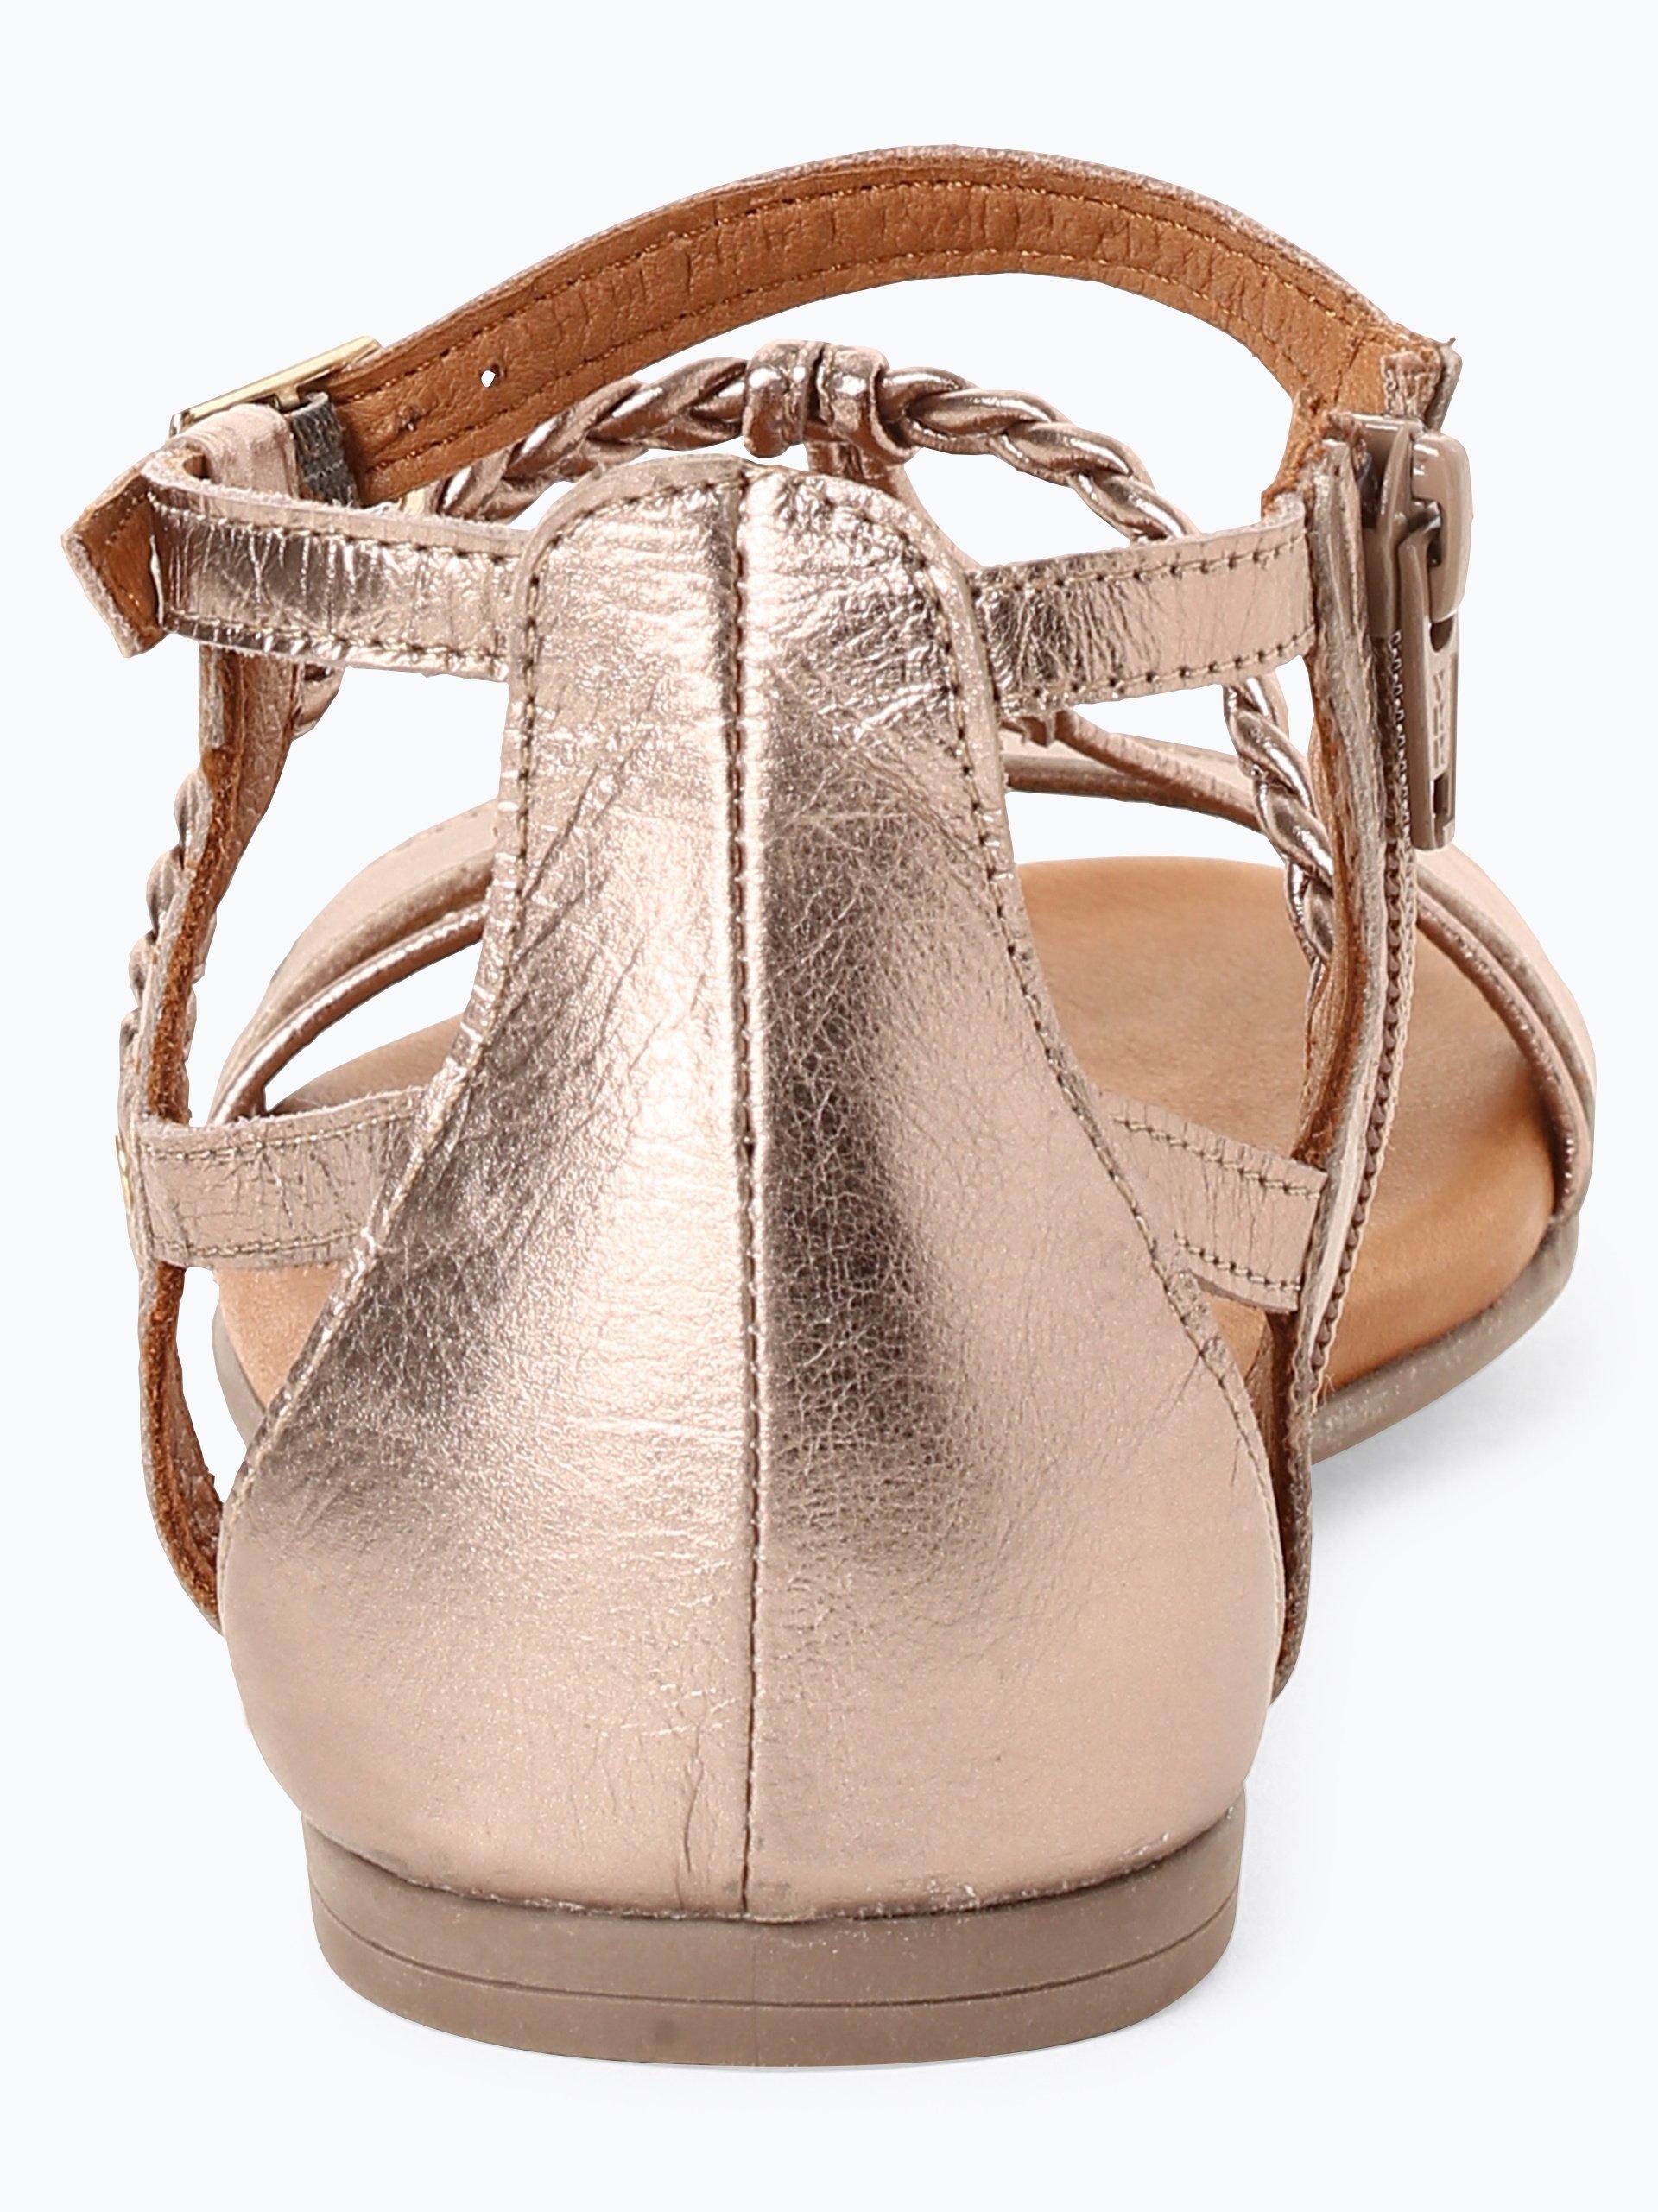 Tamaris Damen Sandalen aus Leder